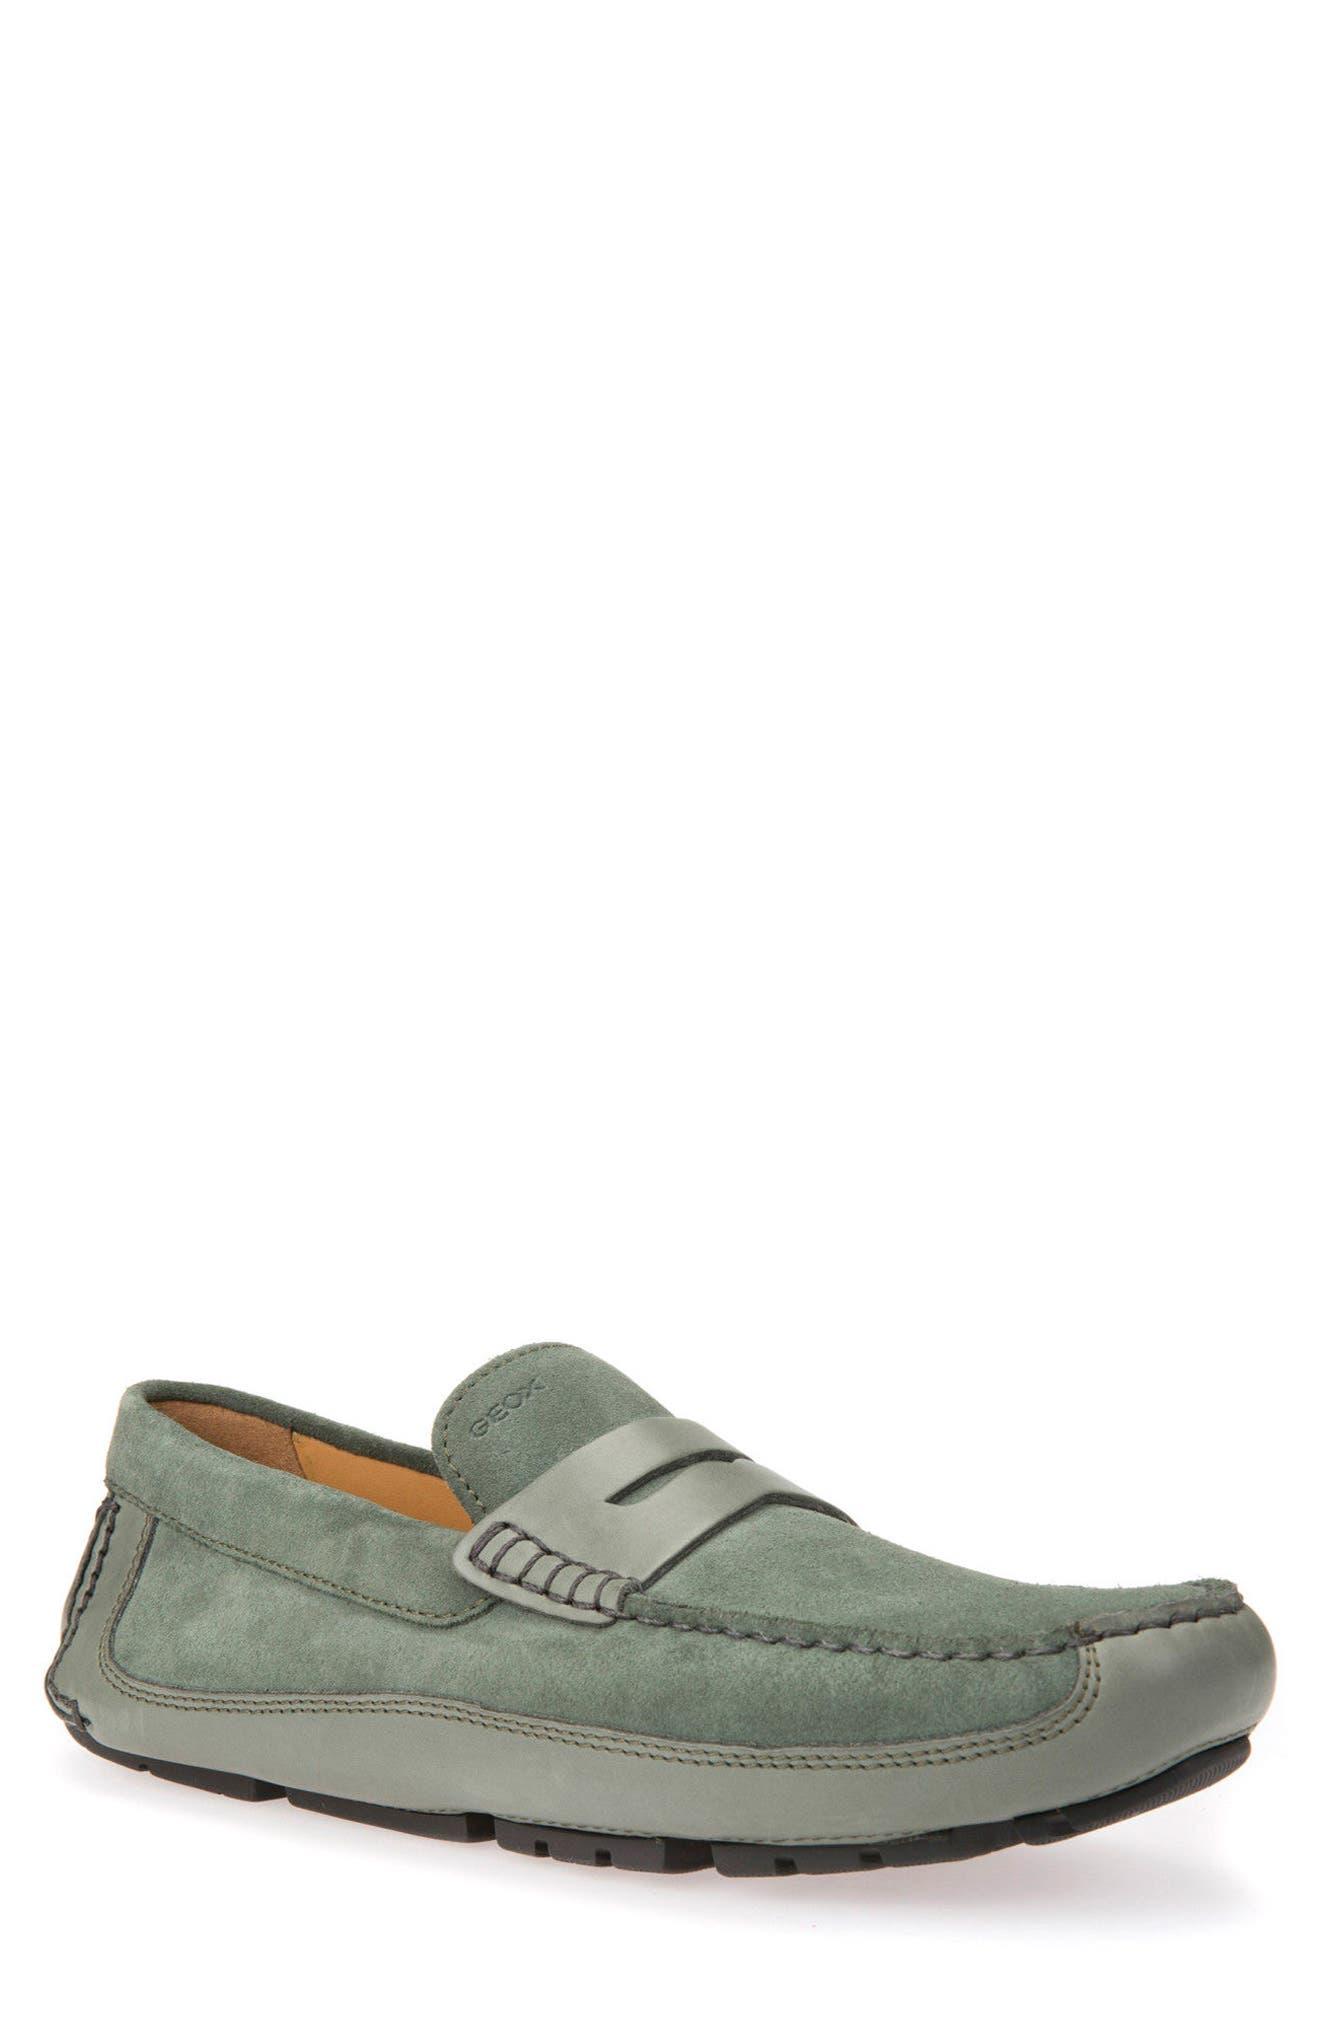 Melbourne 4 Driving Loafer,                             Main thumbnail 1, color,                             Sage